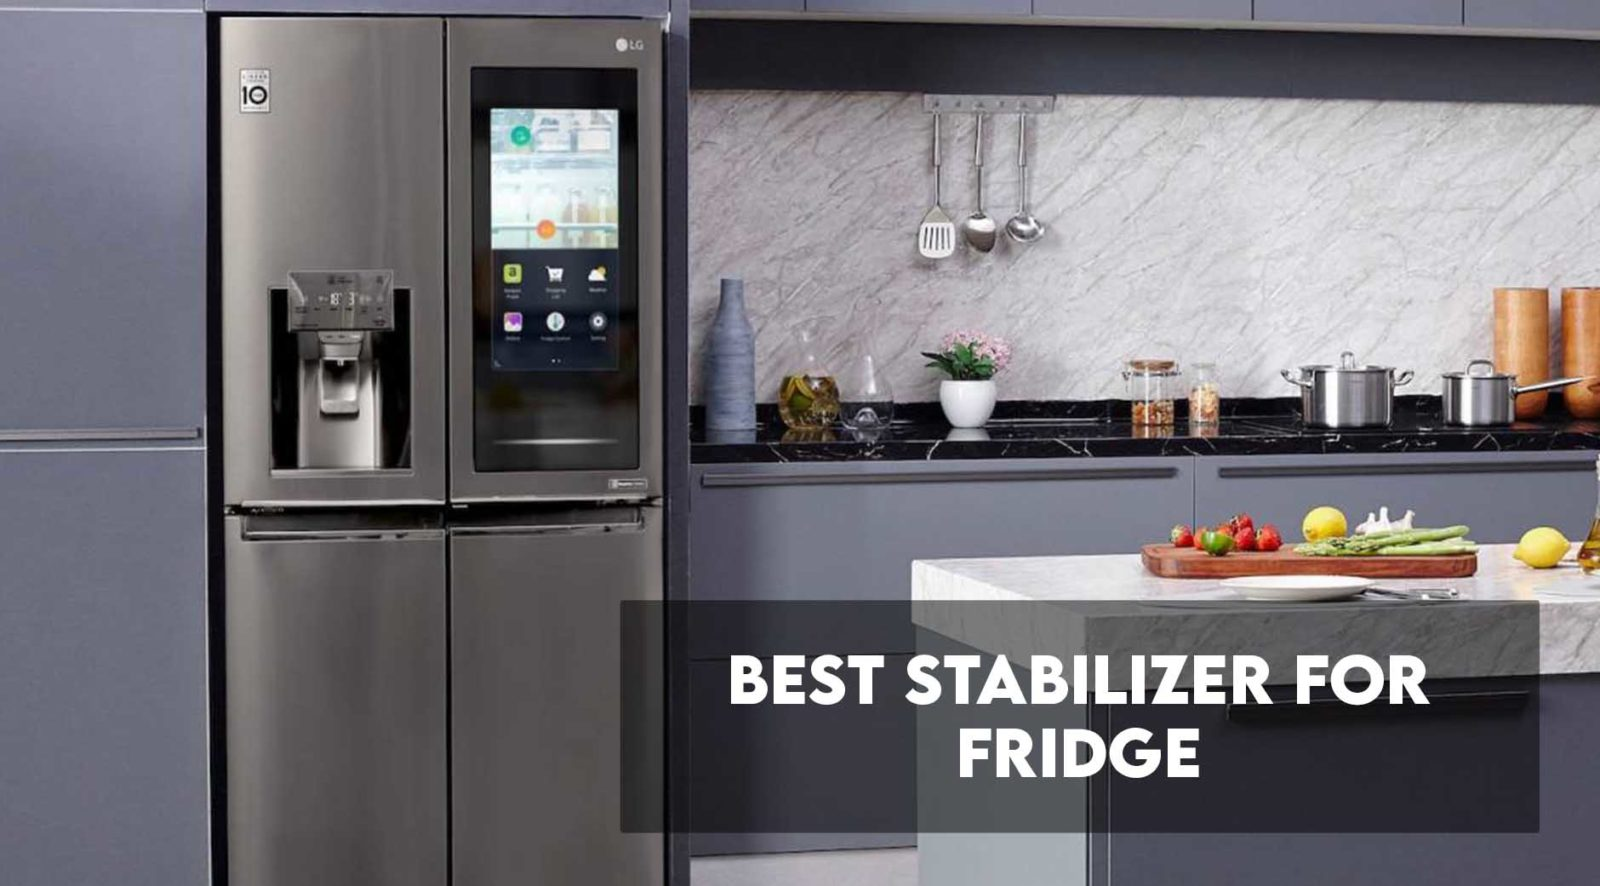 Best Stabilizer For Fridge